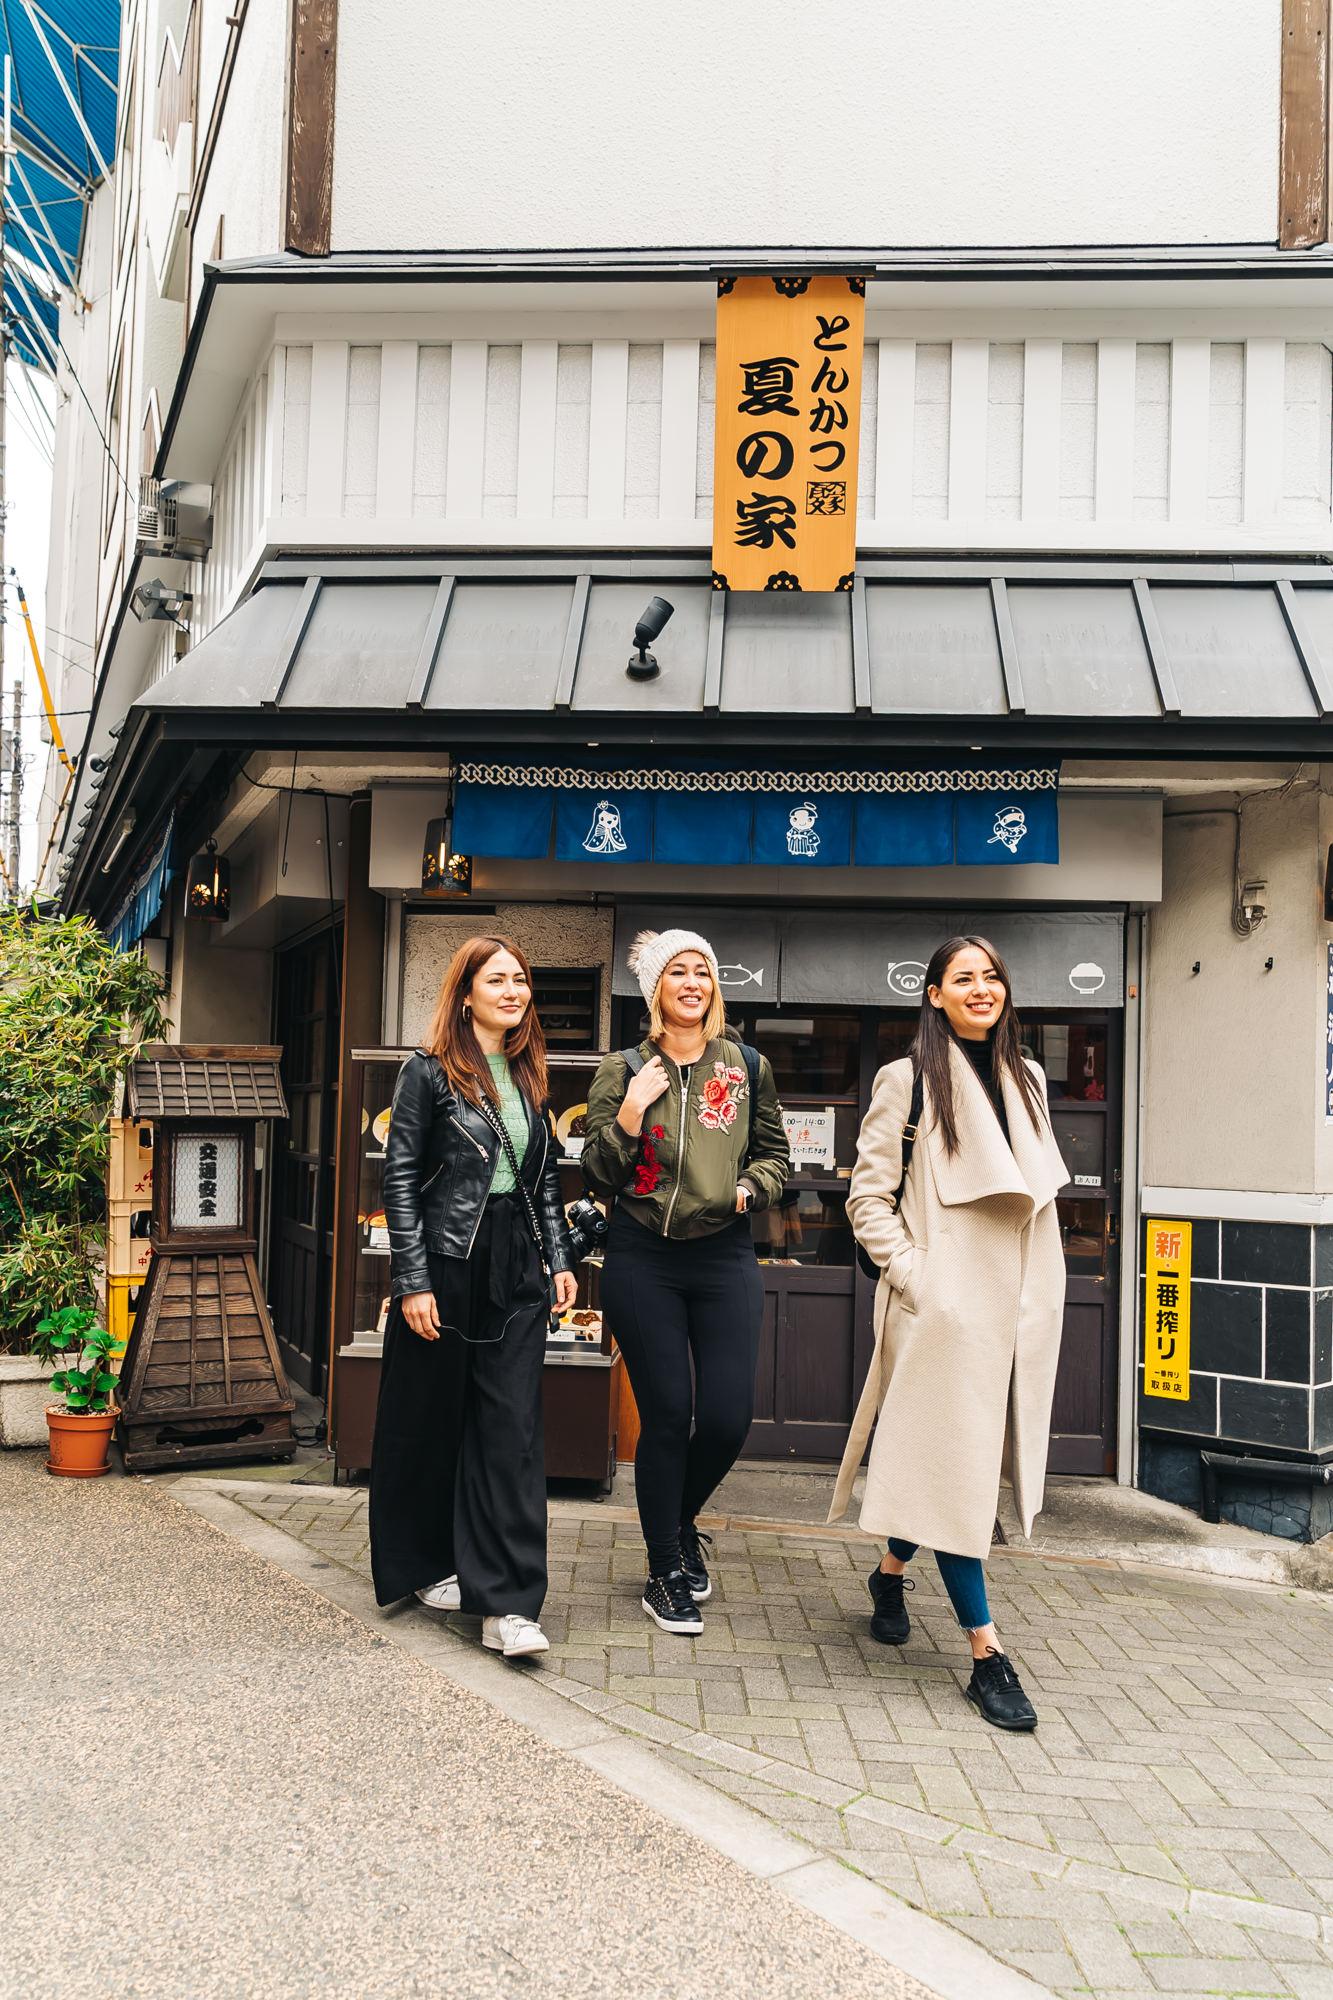 Natsunoya restaurant in Asakusa